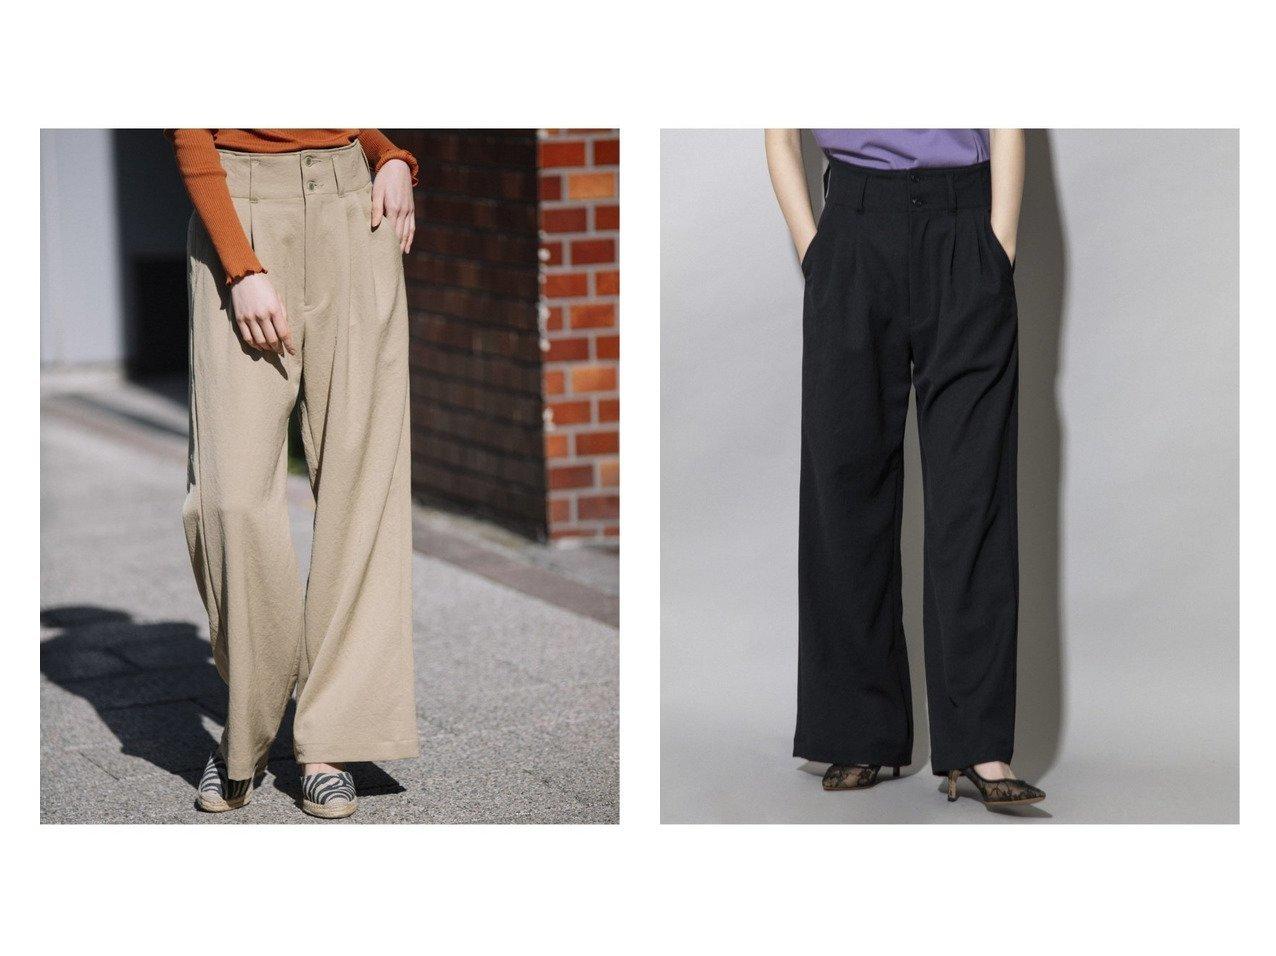 【Munich/ミューニック】のトリアセテートファイバーオックス タックワイドパンツ 【パンツ】おすすめ!人気、トレンド・レディースファッションの通販 おすすめで人気の流行・トレンド、ファッションの通販商品 インテリア・家具・メンズファッション・キッズファッション・レディースファッション・服の通販 founy(ファニー) https://founy.com/ ファッション Fashion レディースファッション WOMEN パンツ Pants オックス 吸水 ジーンズ ストレッチ デニム ワイド おすすめ Recommend 夏 Summer  ID:crp329100000060212